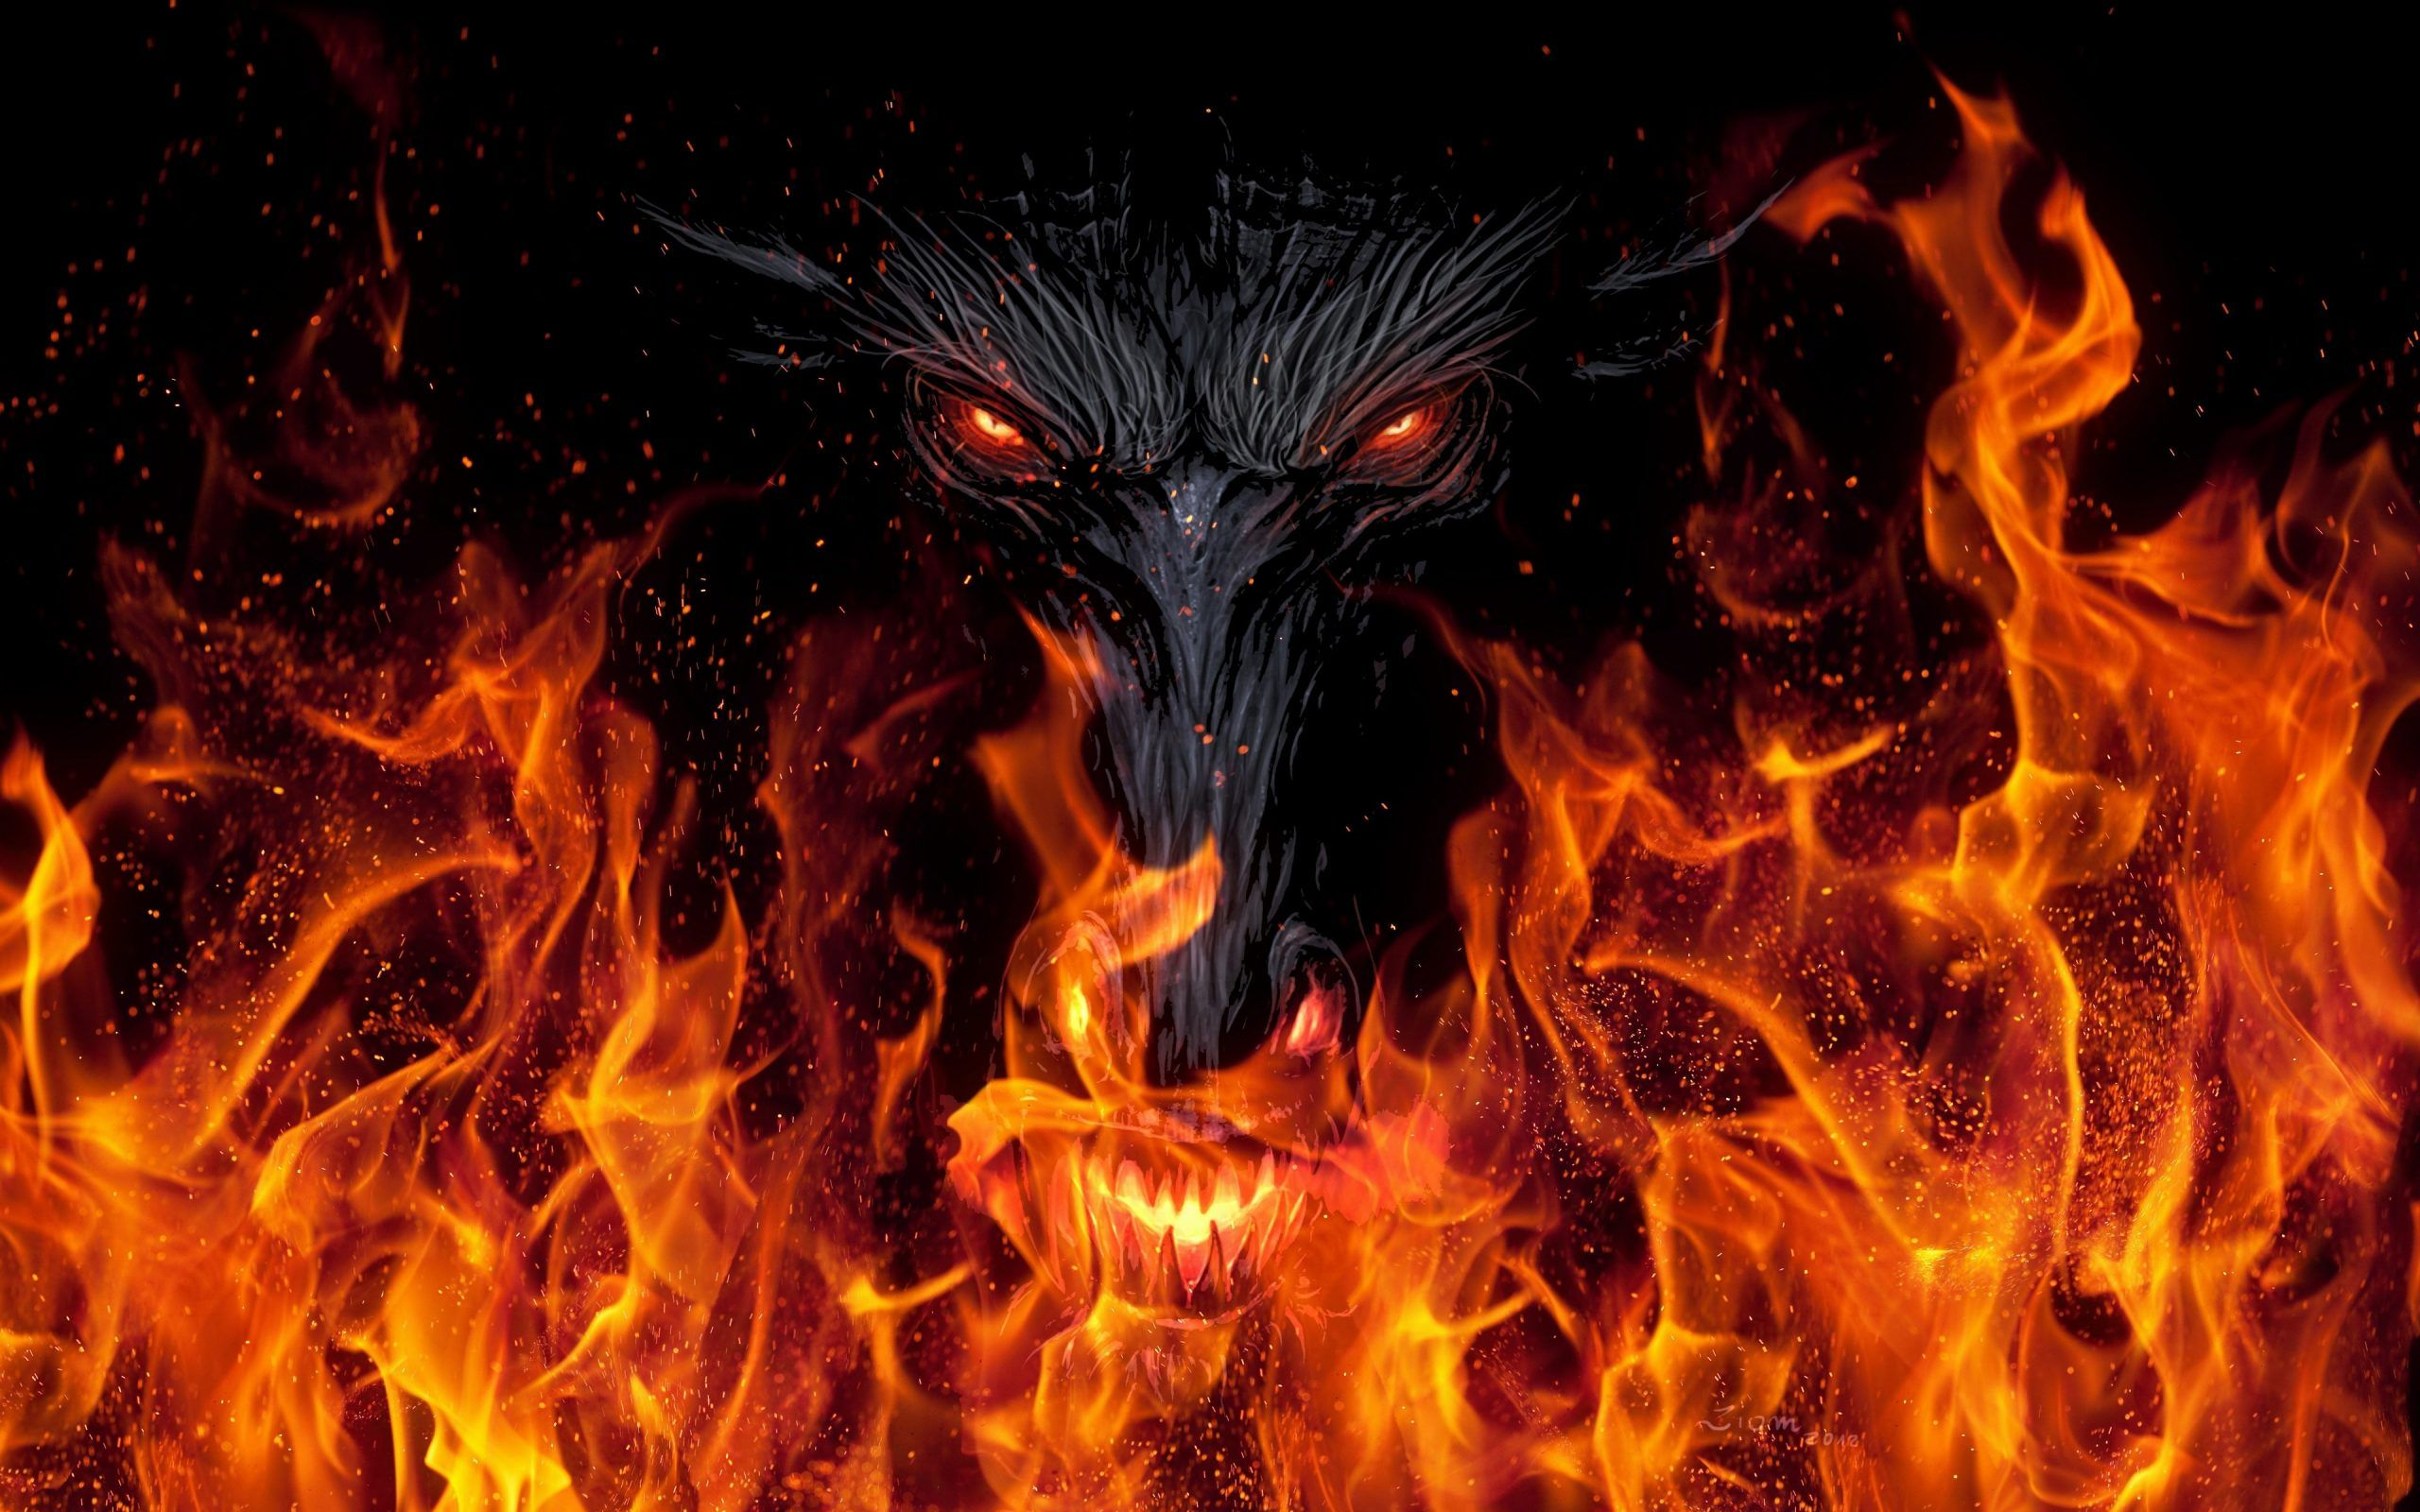 Fire Dragon Wallpapers Desktop Background For Free Wallpaper Fire Art Fantasy Art Dragon Eye